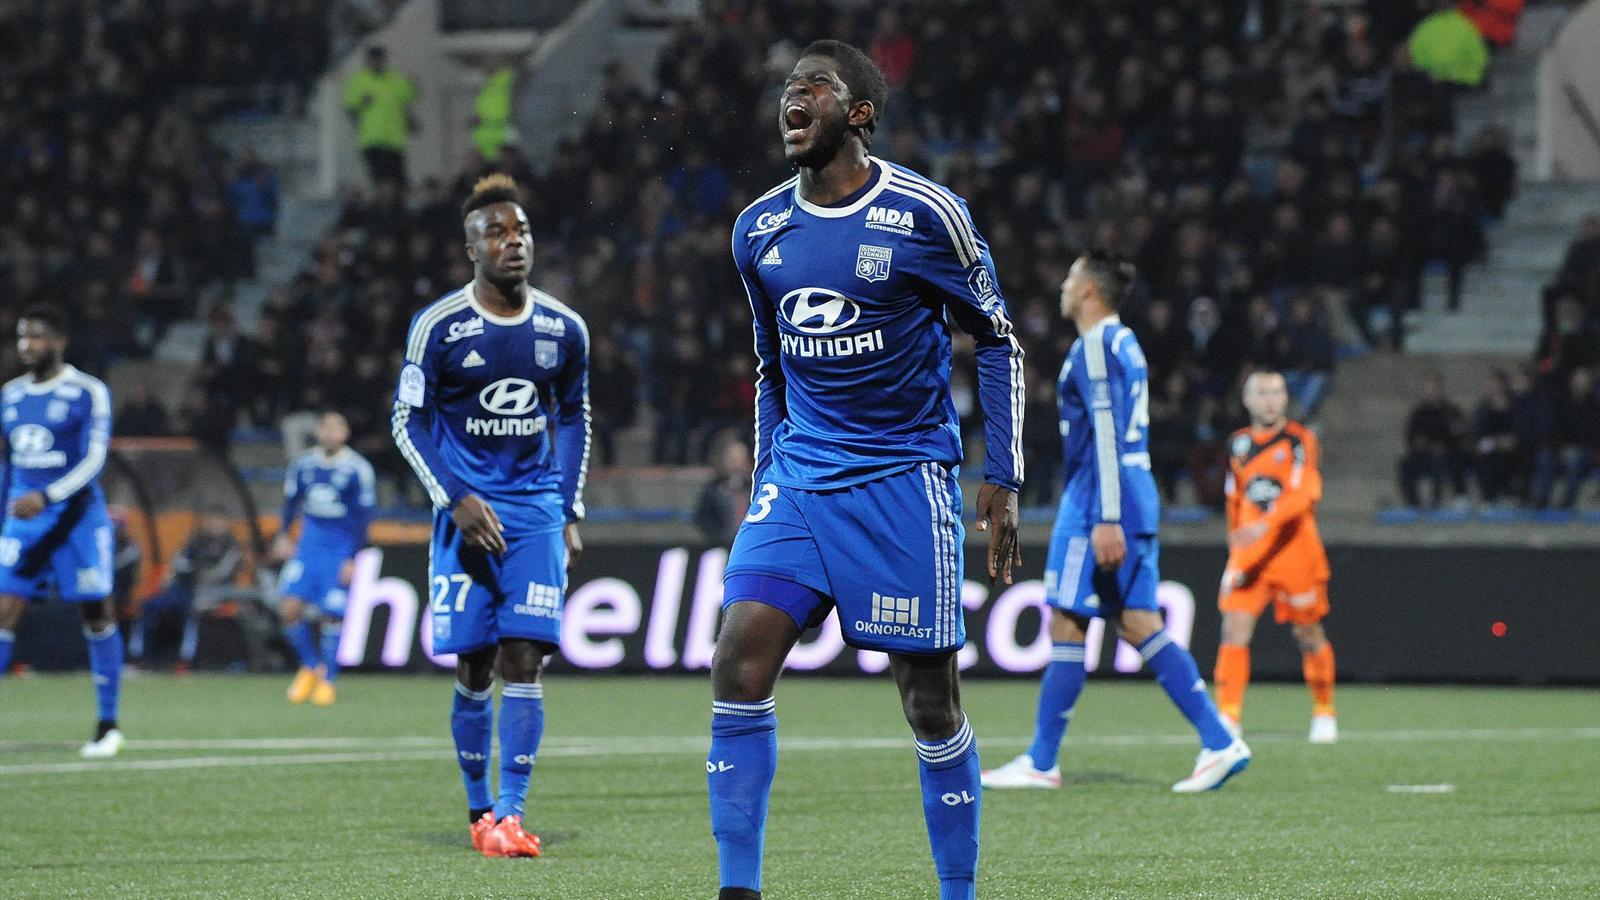 Coupe de france samuel umtiti olympique lyonnais - Resultats coupe de france football 2015 ...